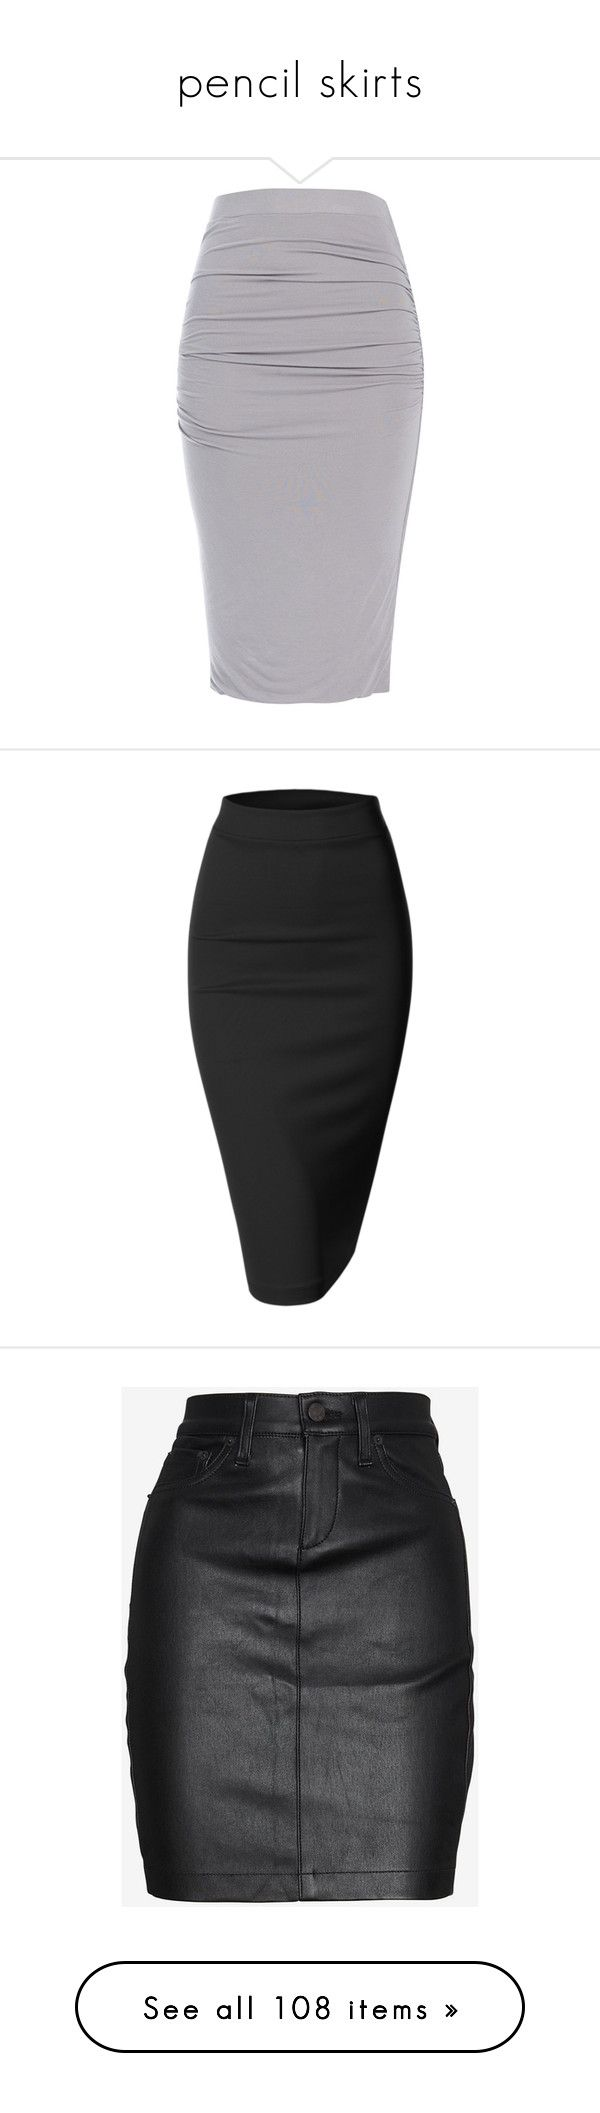 """pencil skirts"" by rowan-asha ❤ liked on Polyvore featuring skirts, bottoms, pencil skirt, knee length pencil skirt, black, stretch midi skirt, slim skirt, calf length pencil skirt, calf length skirts and leather zipper skirt"